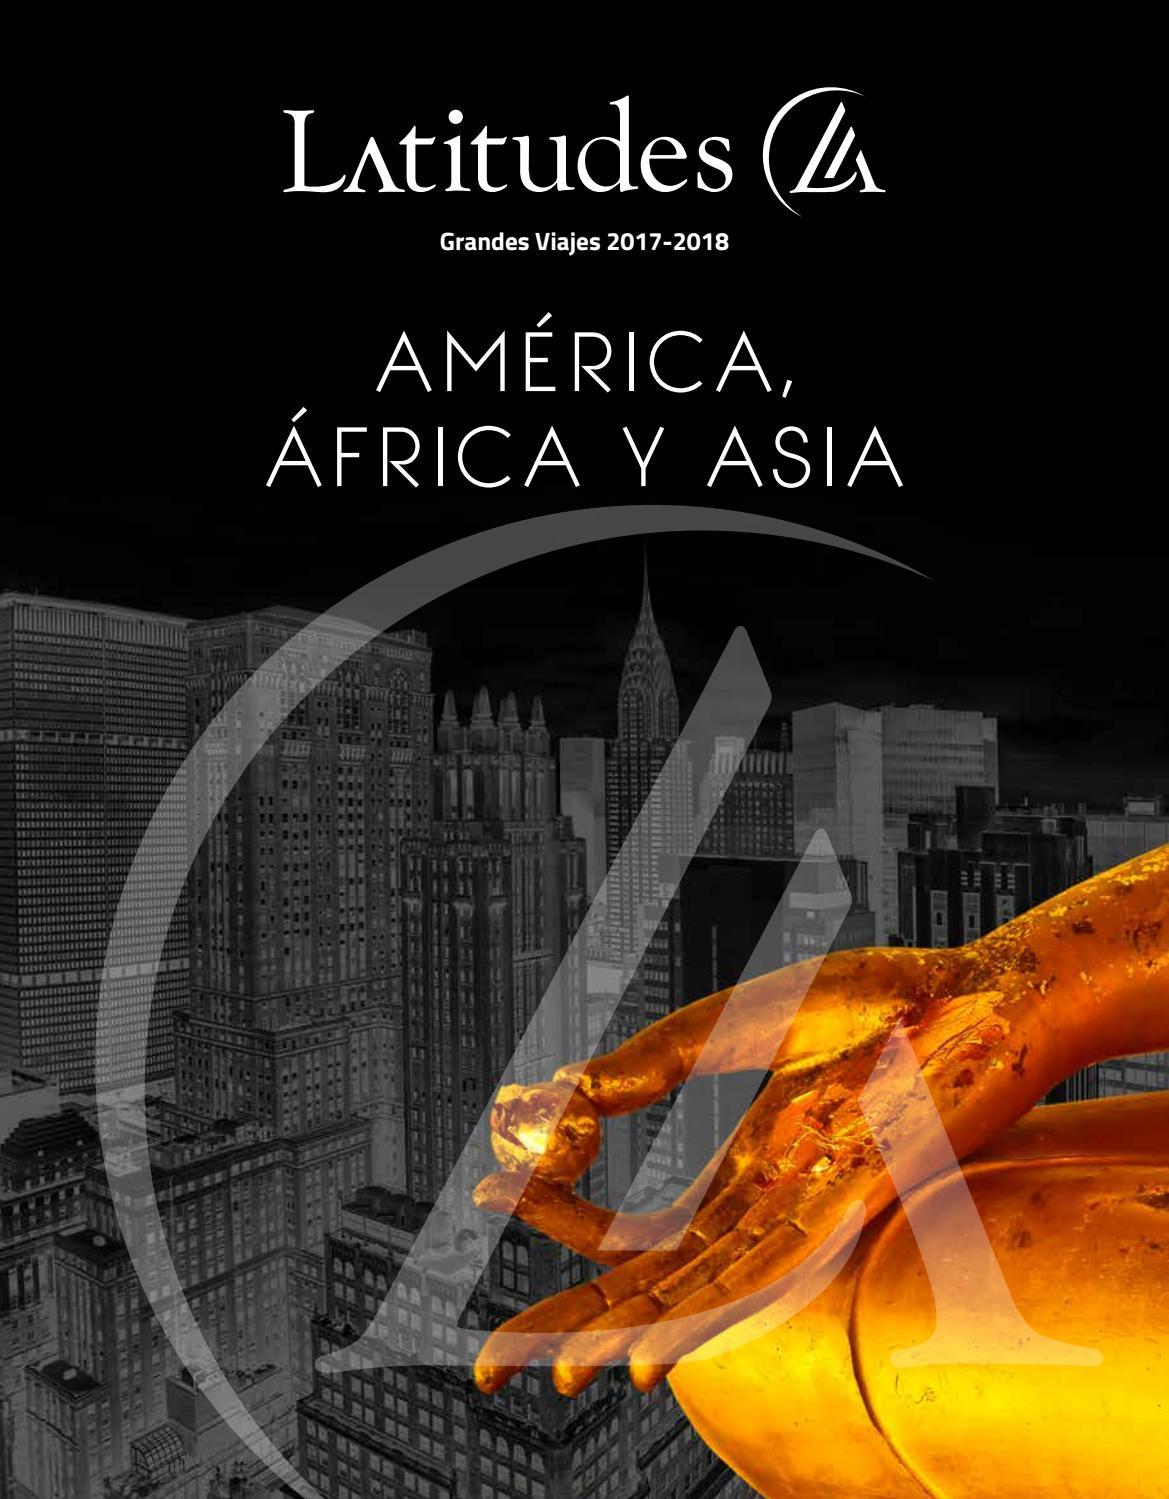 Estudio Dise O Indesigners Cat Logo De Viajes Latitudes Grandes  # Puka Muebles Oriente